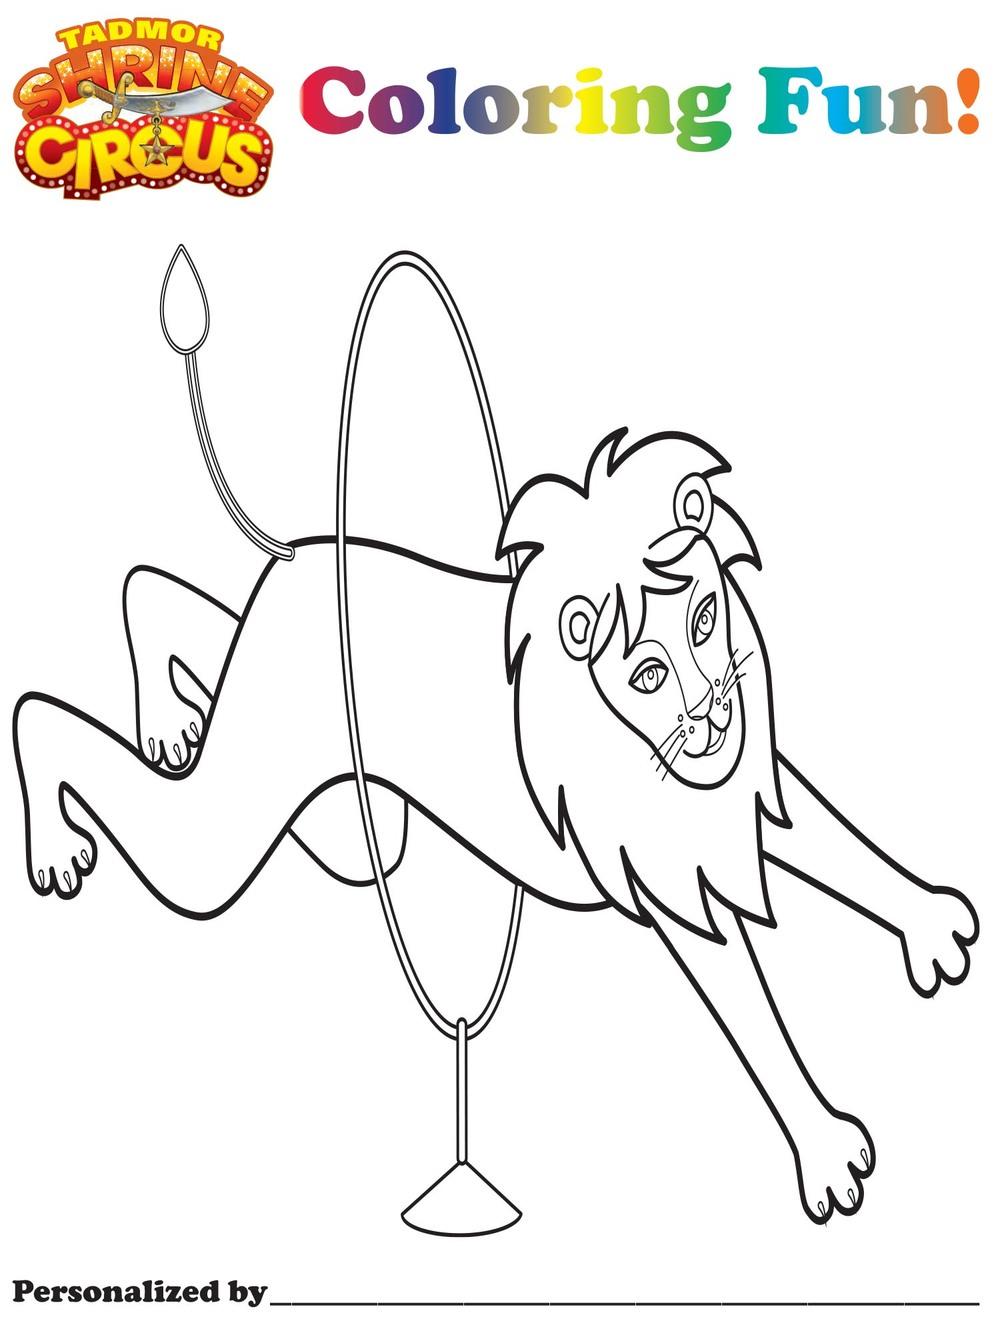 tadmor shrine circus canton ohio and akron ohio u2014 coloring pages